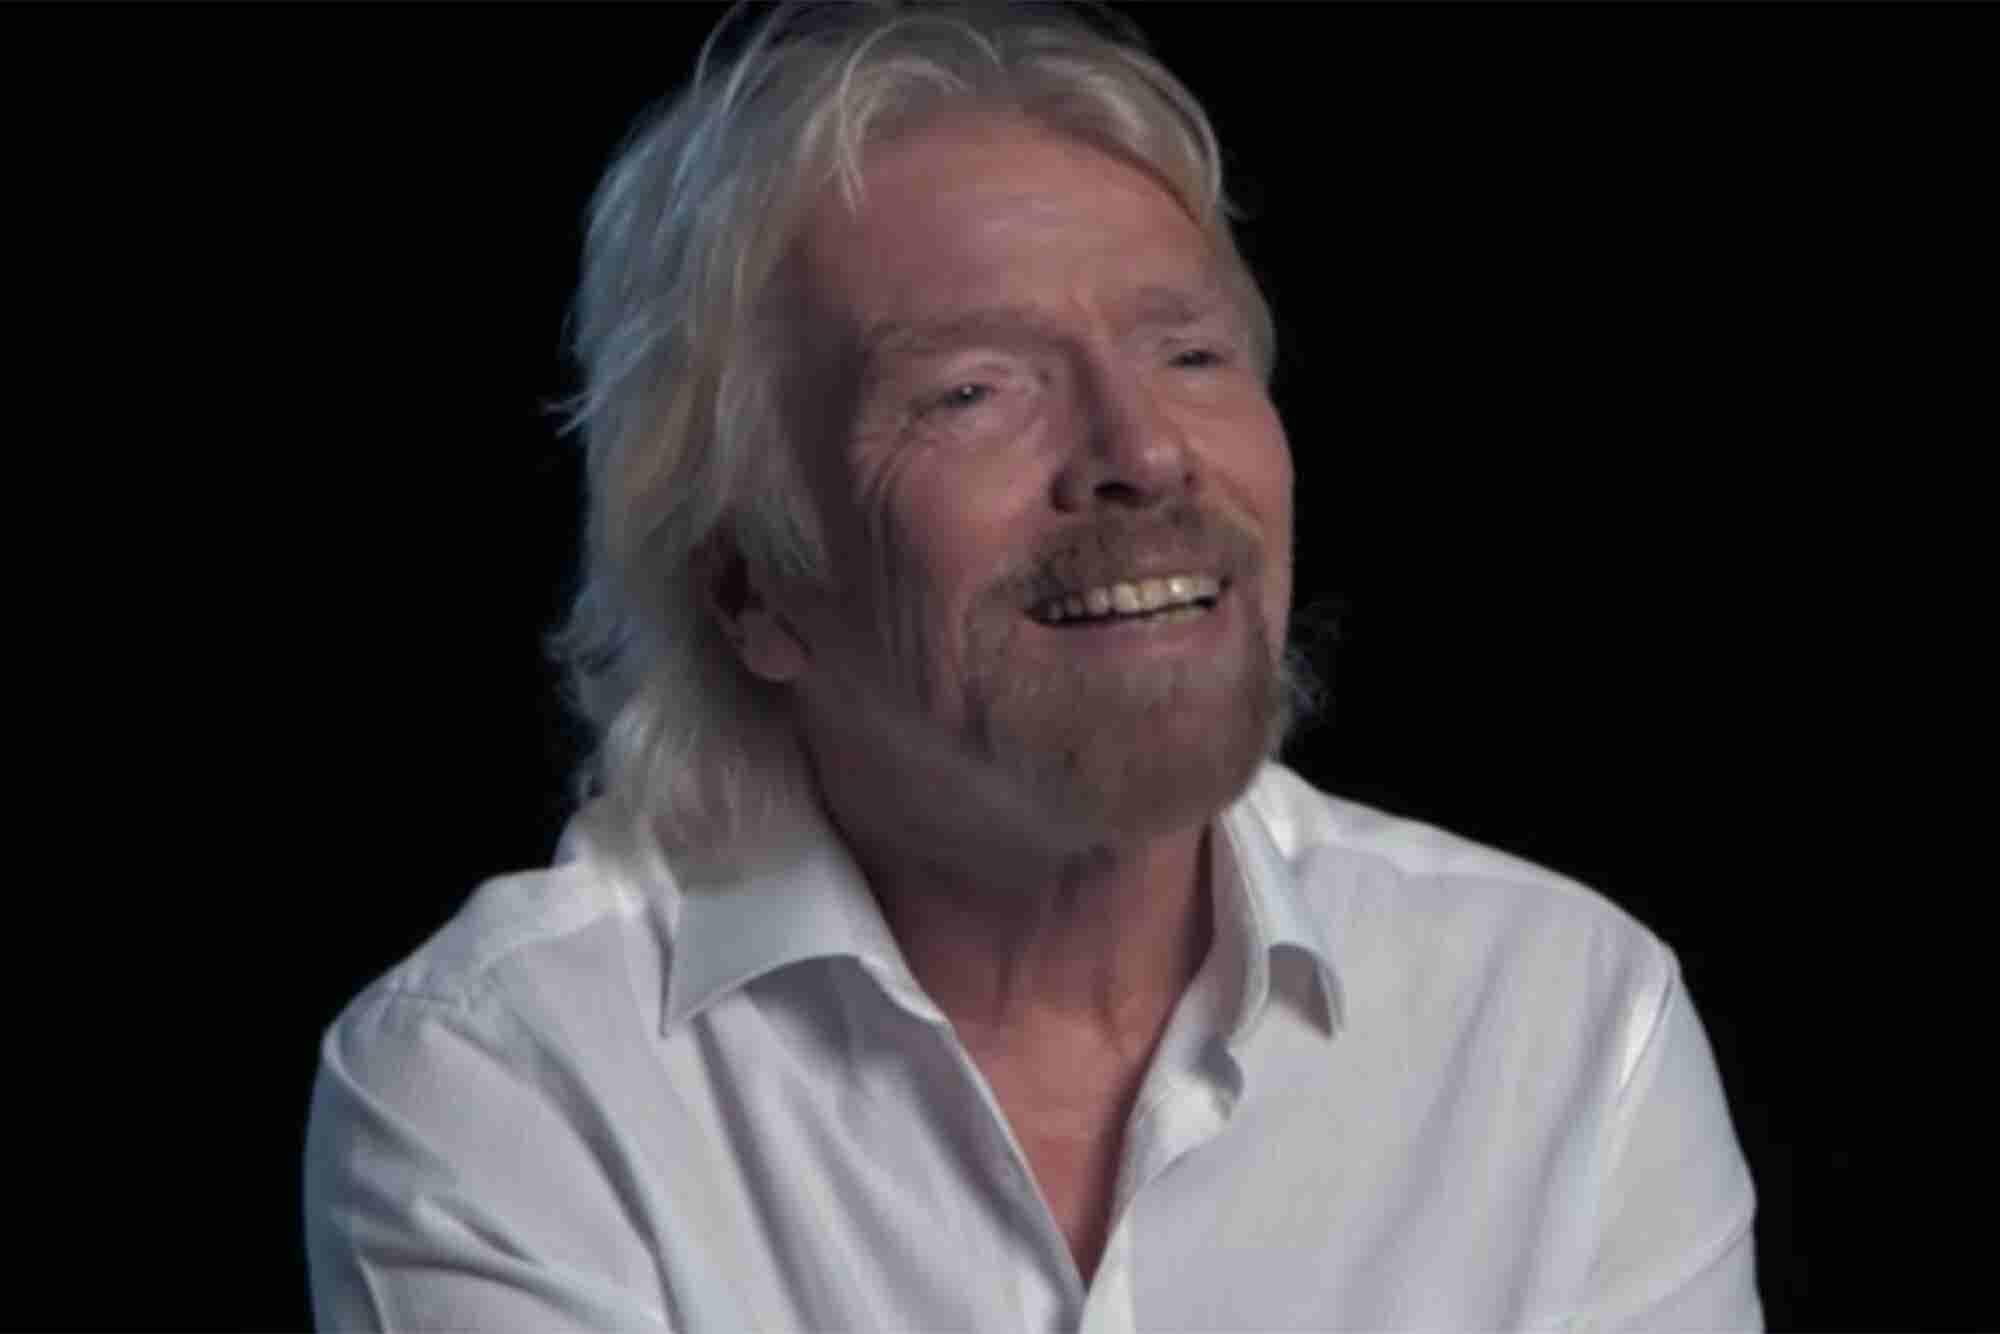 From Steven Spielberg to Richard Branson, Successful Entrepreneurs Share Their Secrets